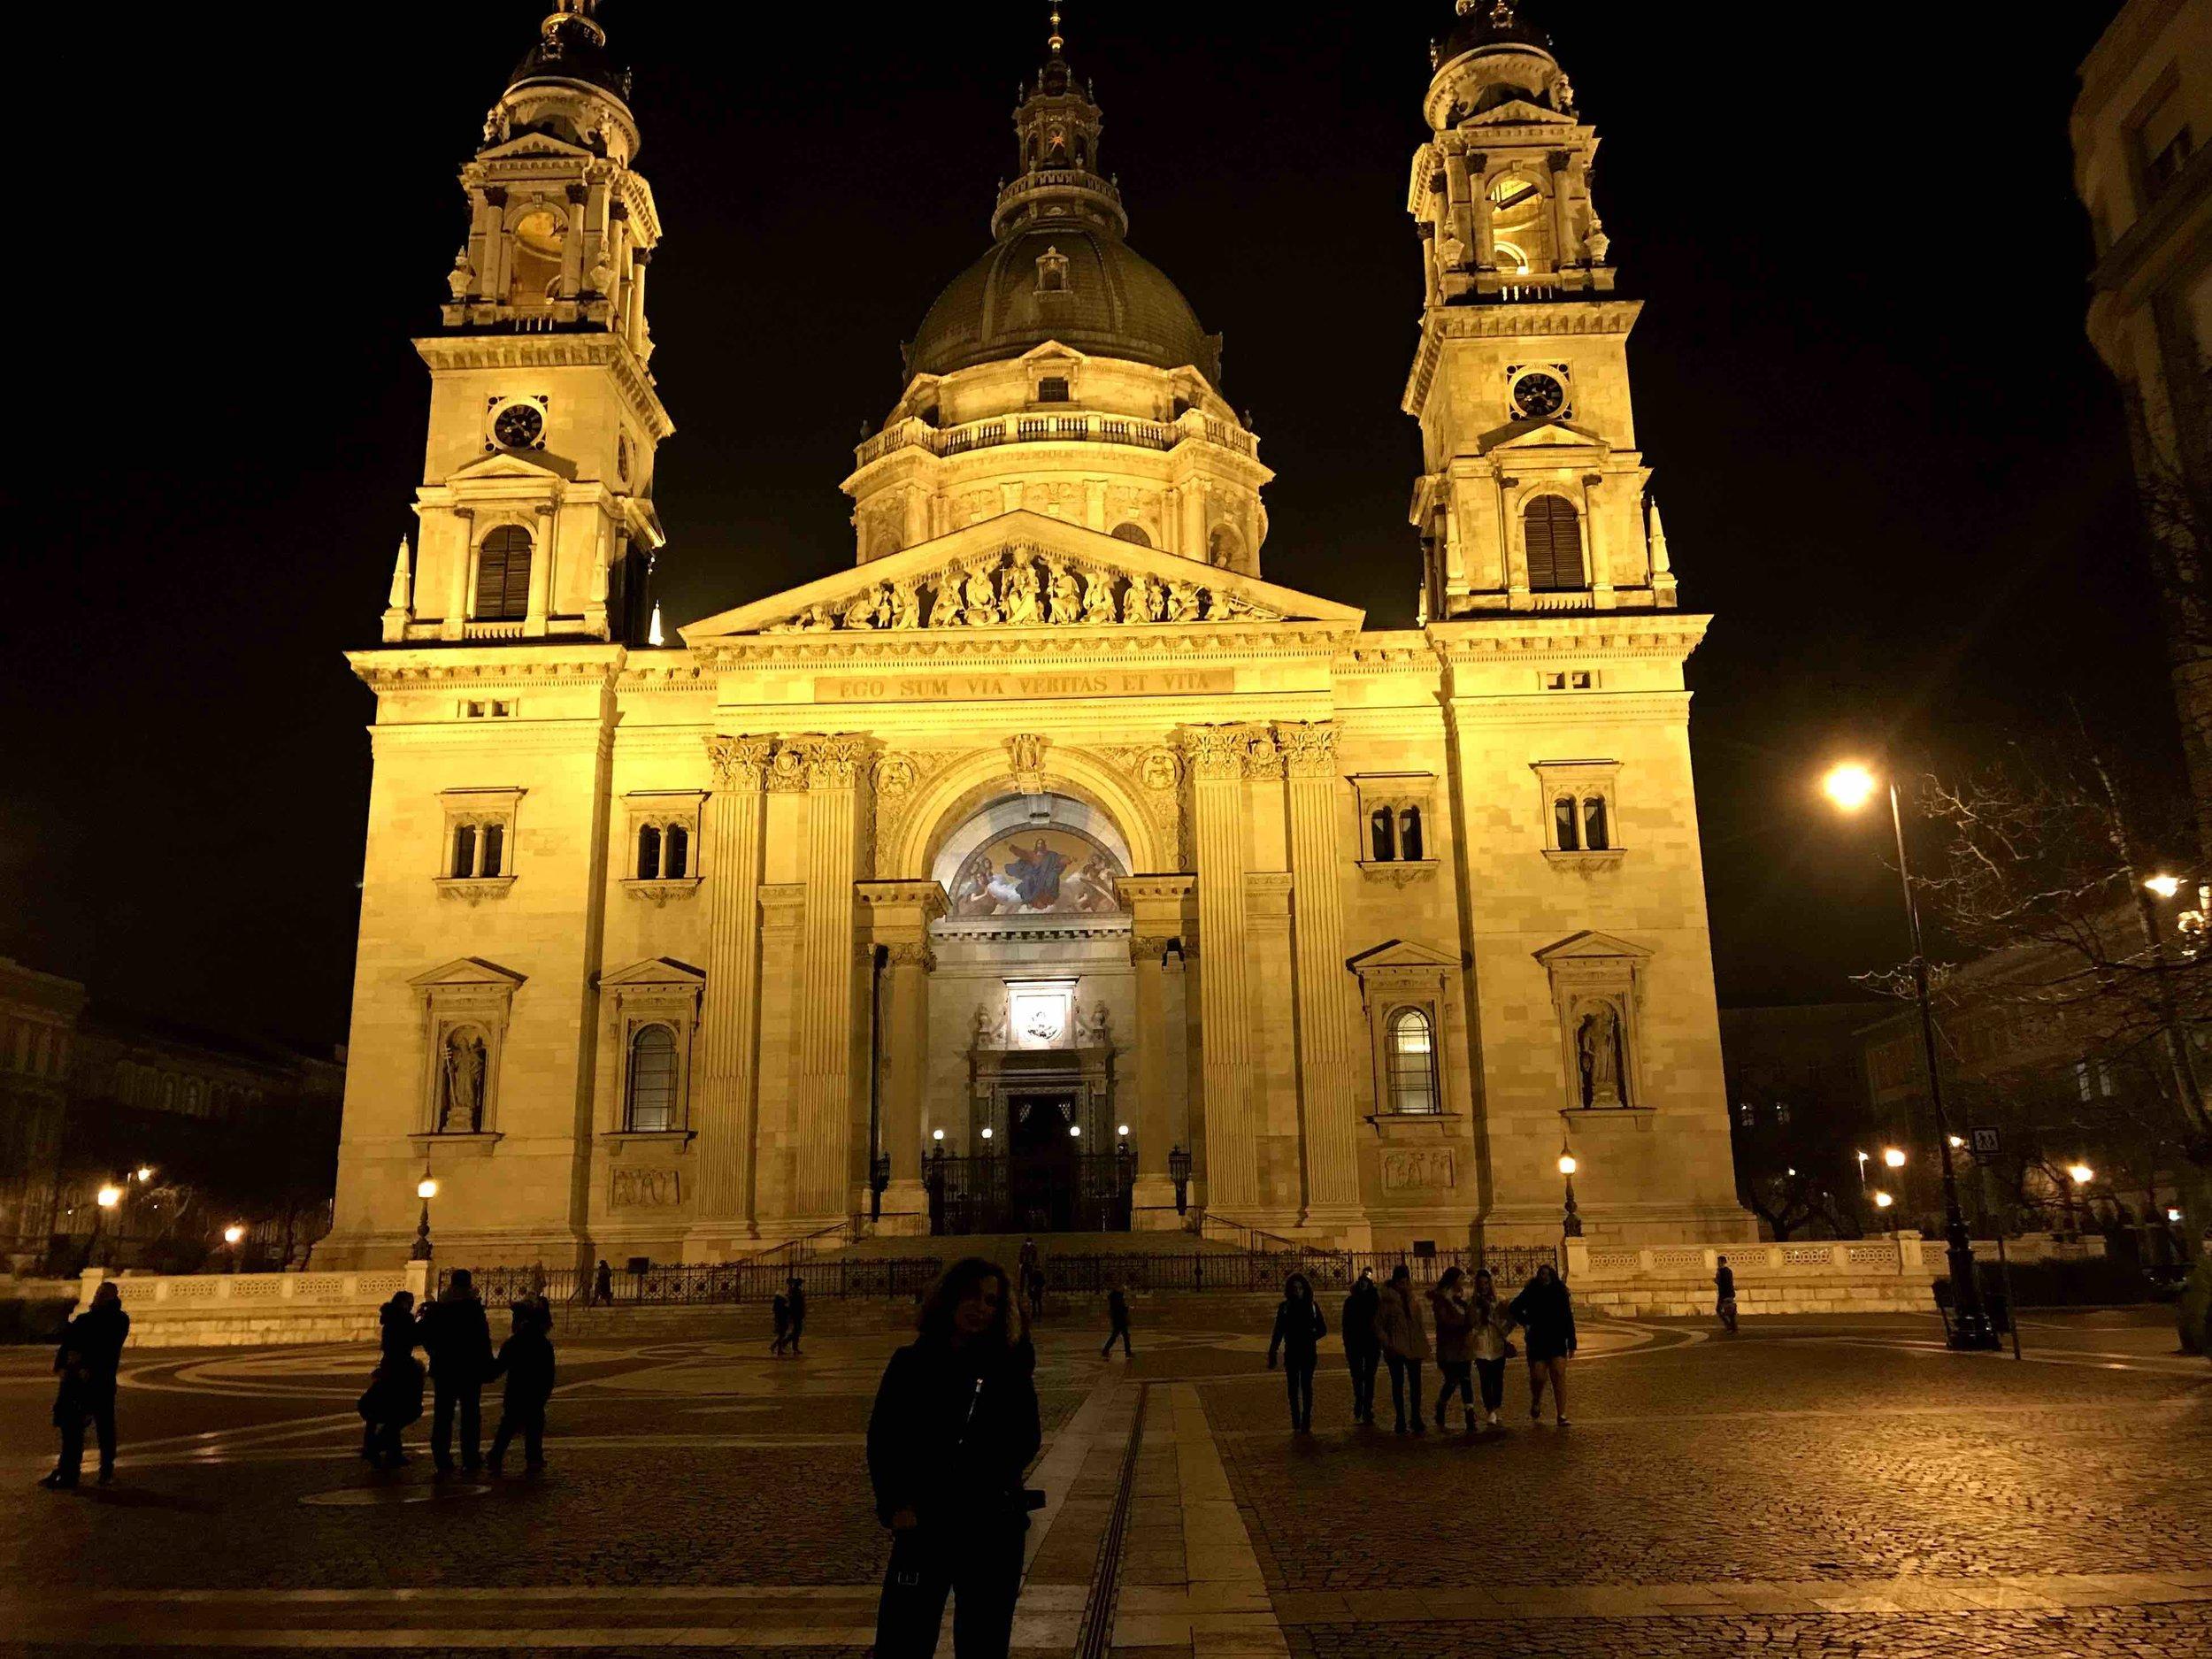 St. Stephen's Basilica IMG_0227.jpg